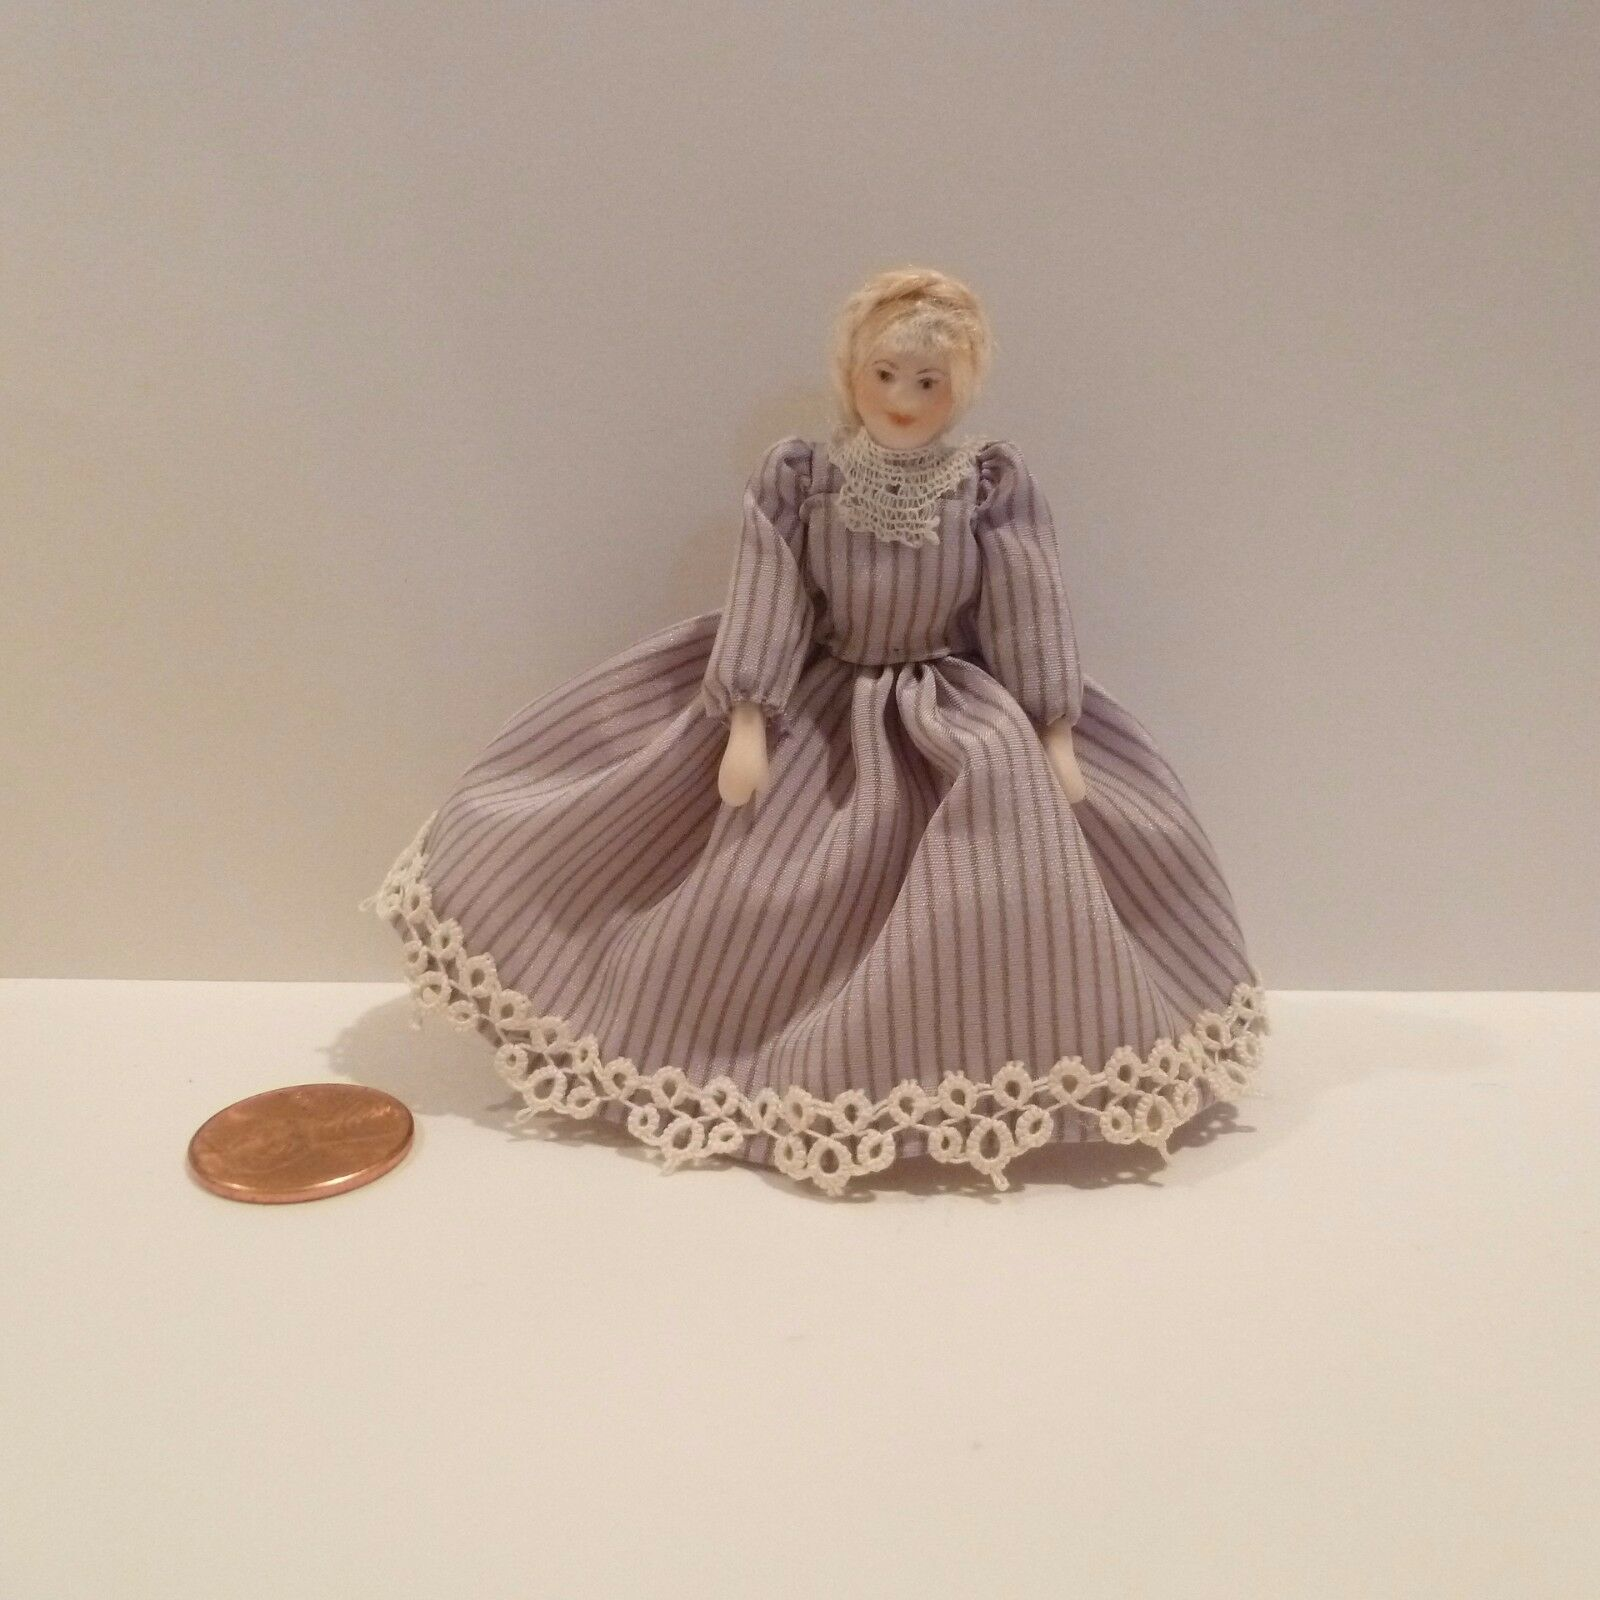 Miniatura 1 2  Escala Miniatura Muñeca señora con vestido